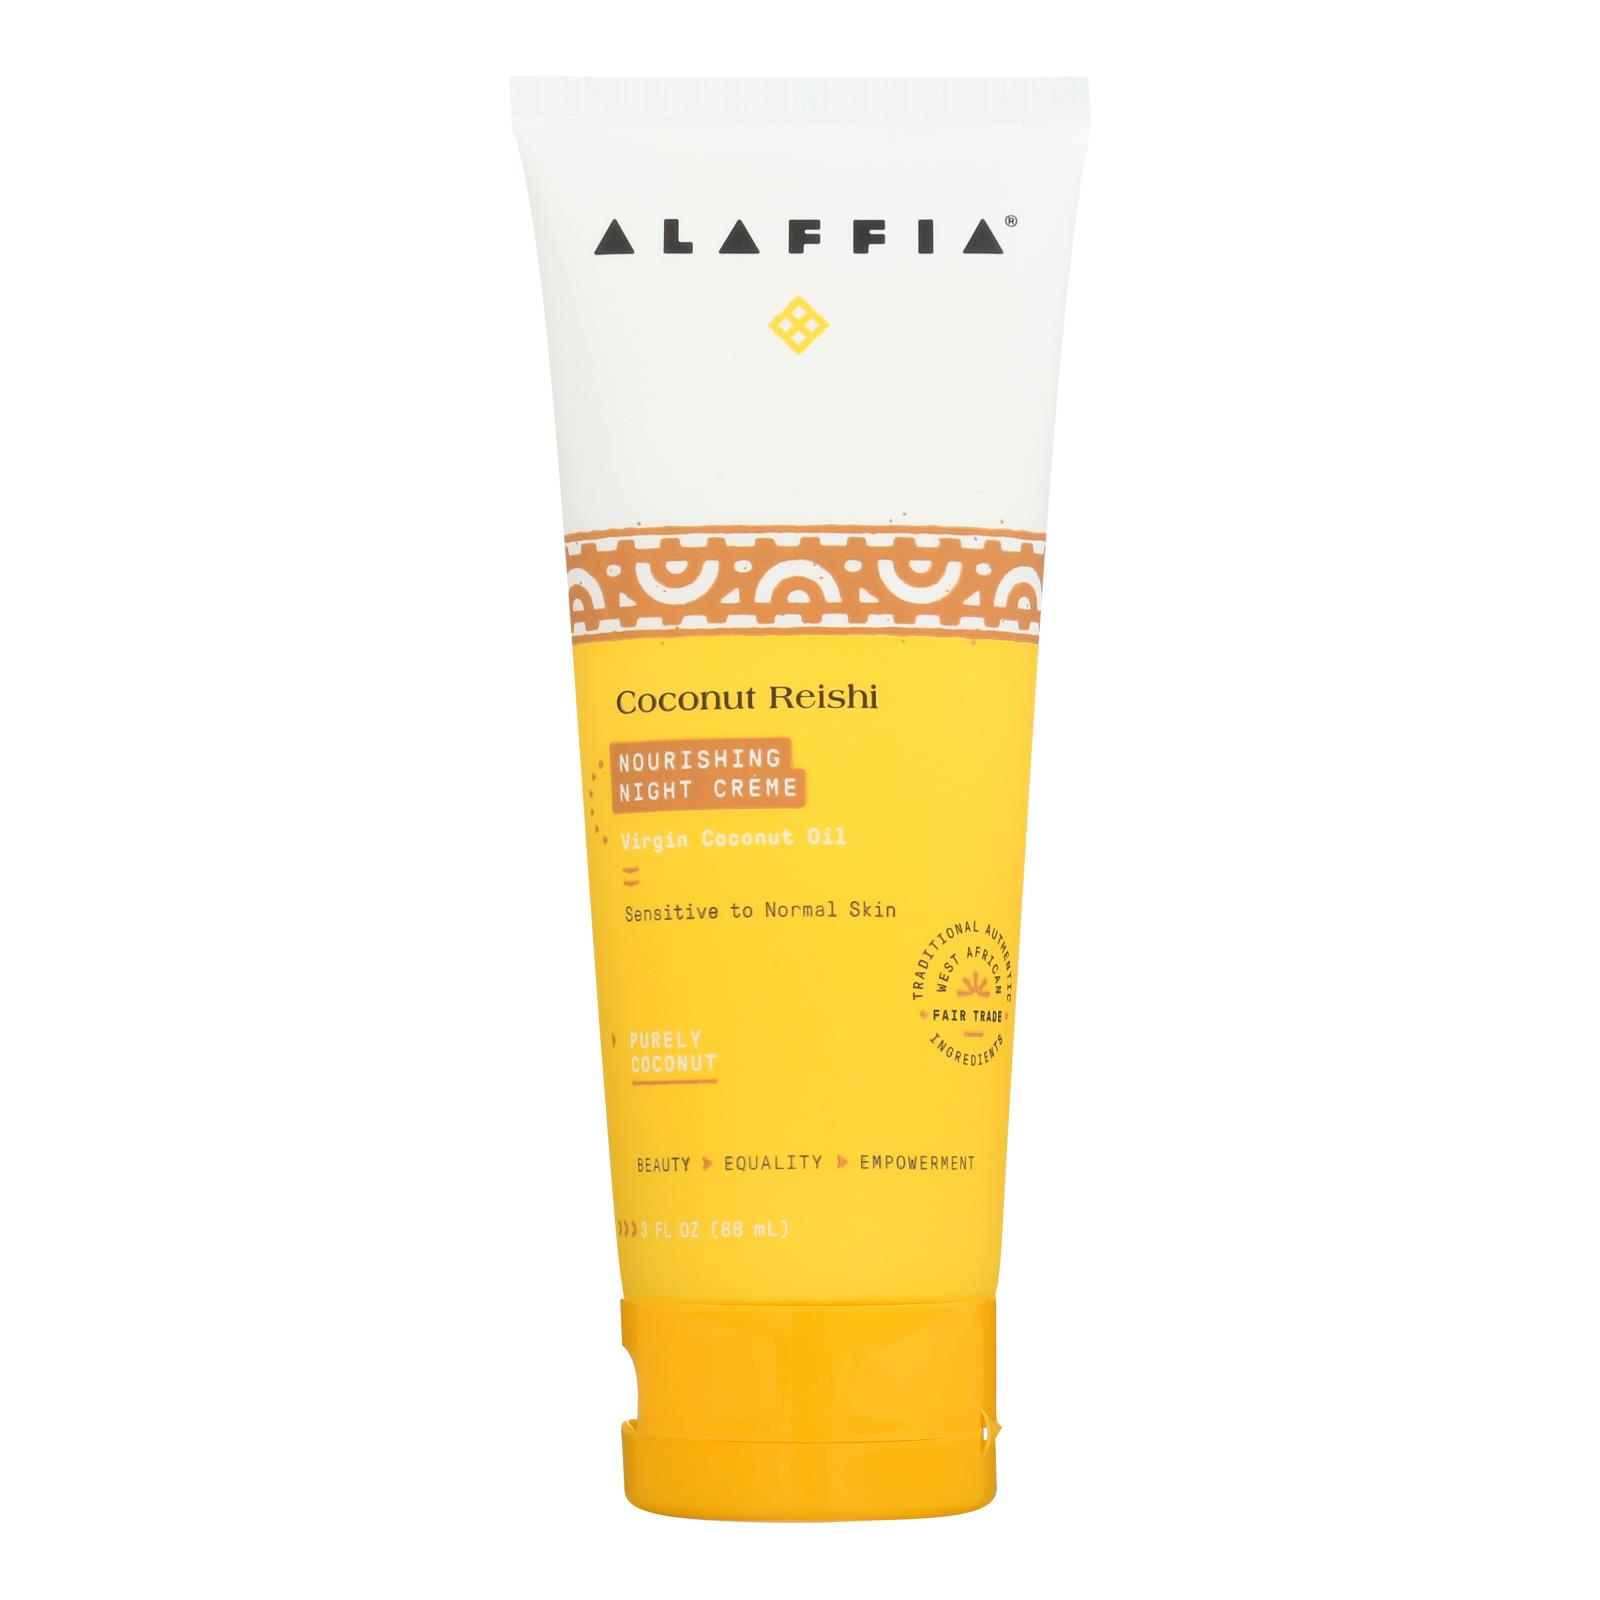 Alaffia - Night Cream - Coconut Reishi - 3 fl oz.